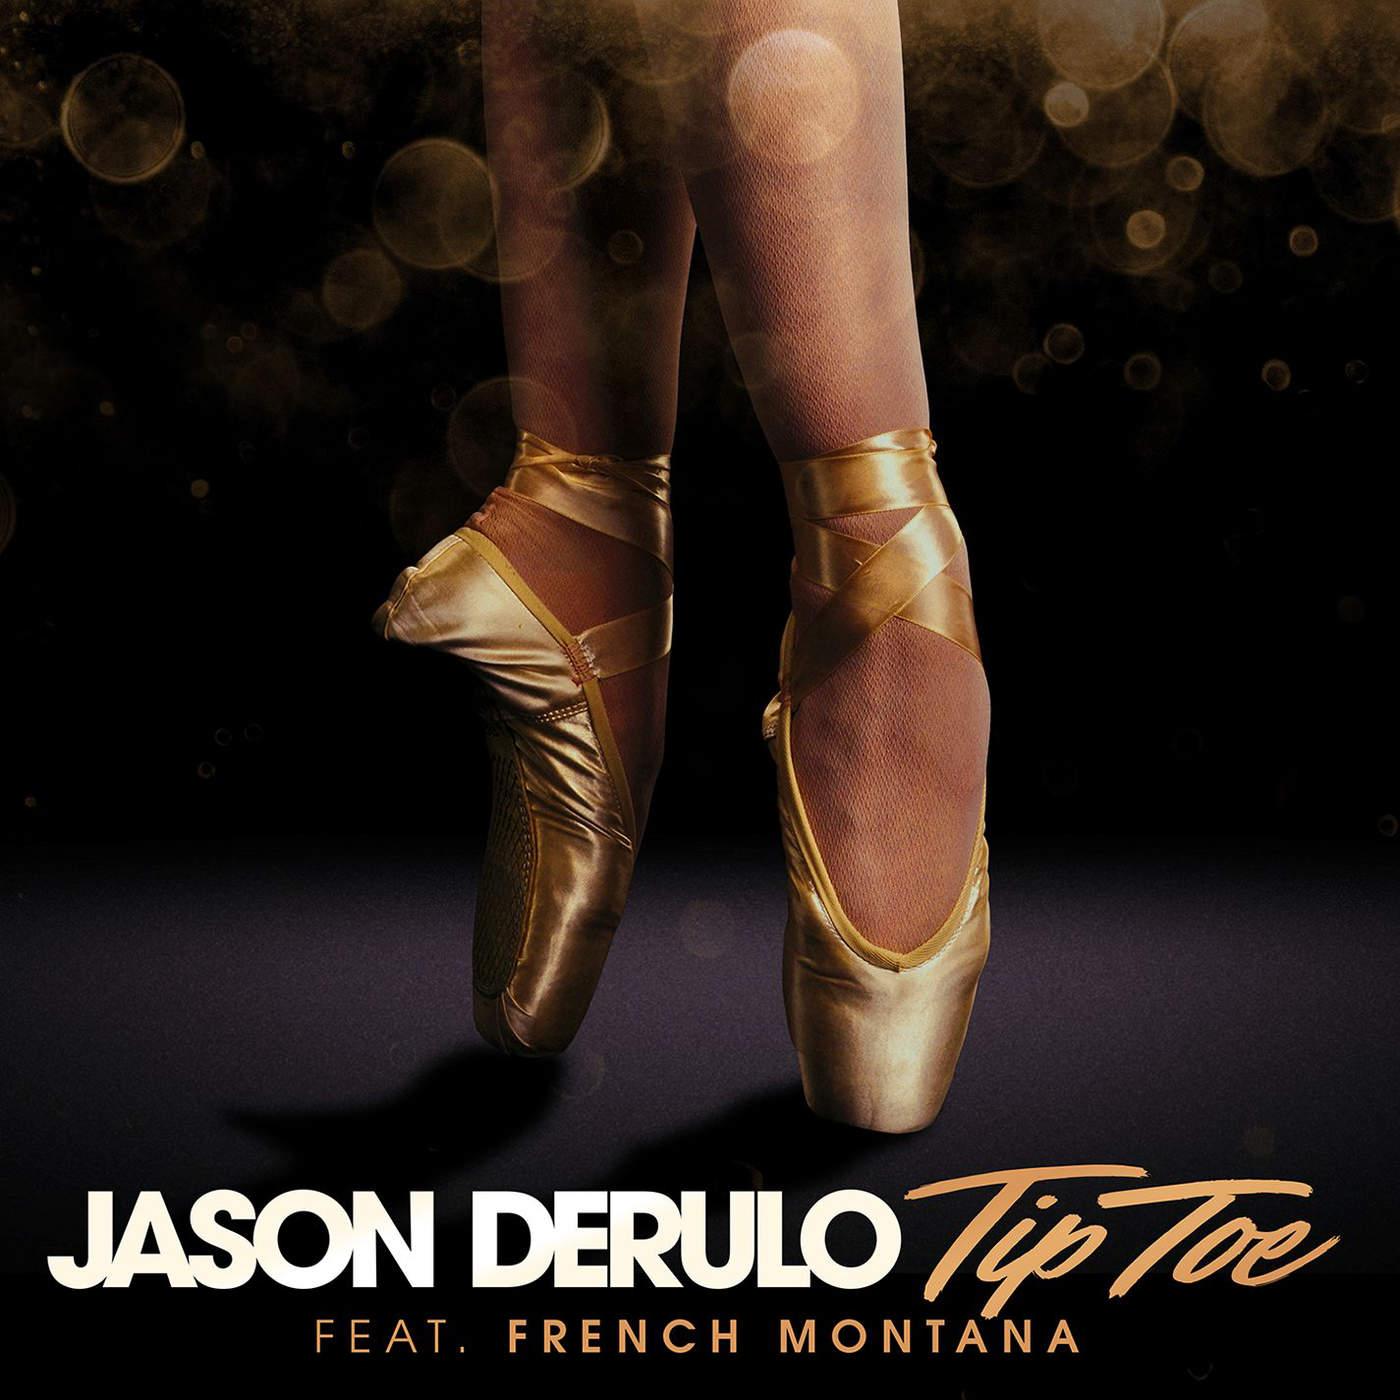 Jason Derulo – Tip Toe (feat. French Montana)